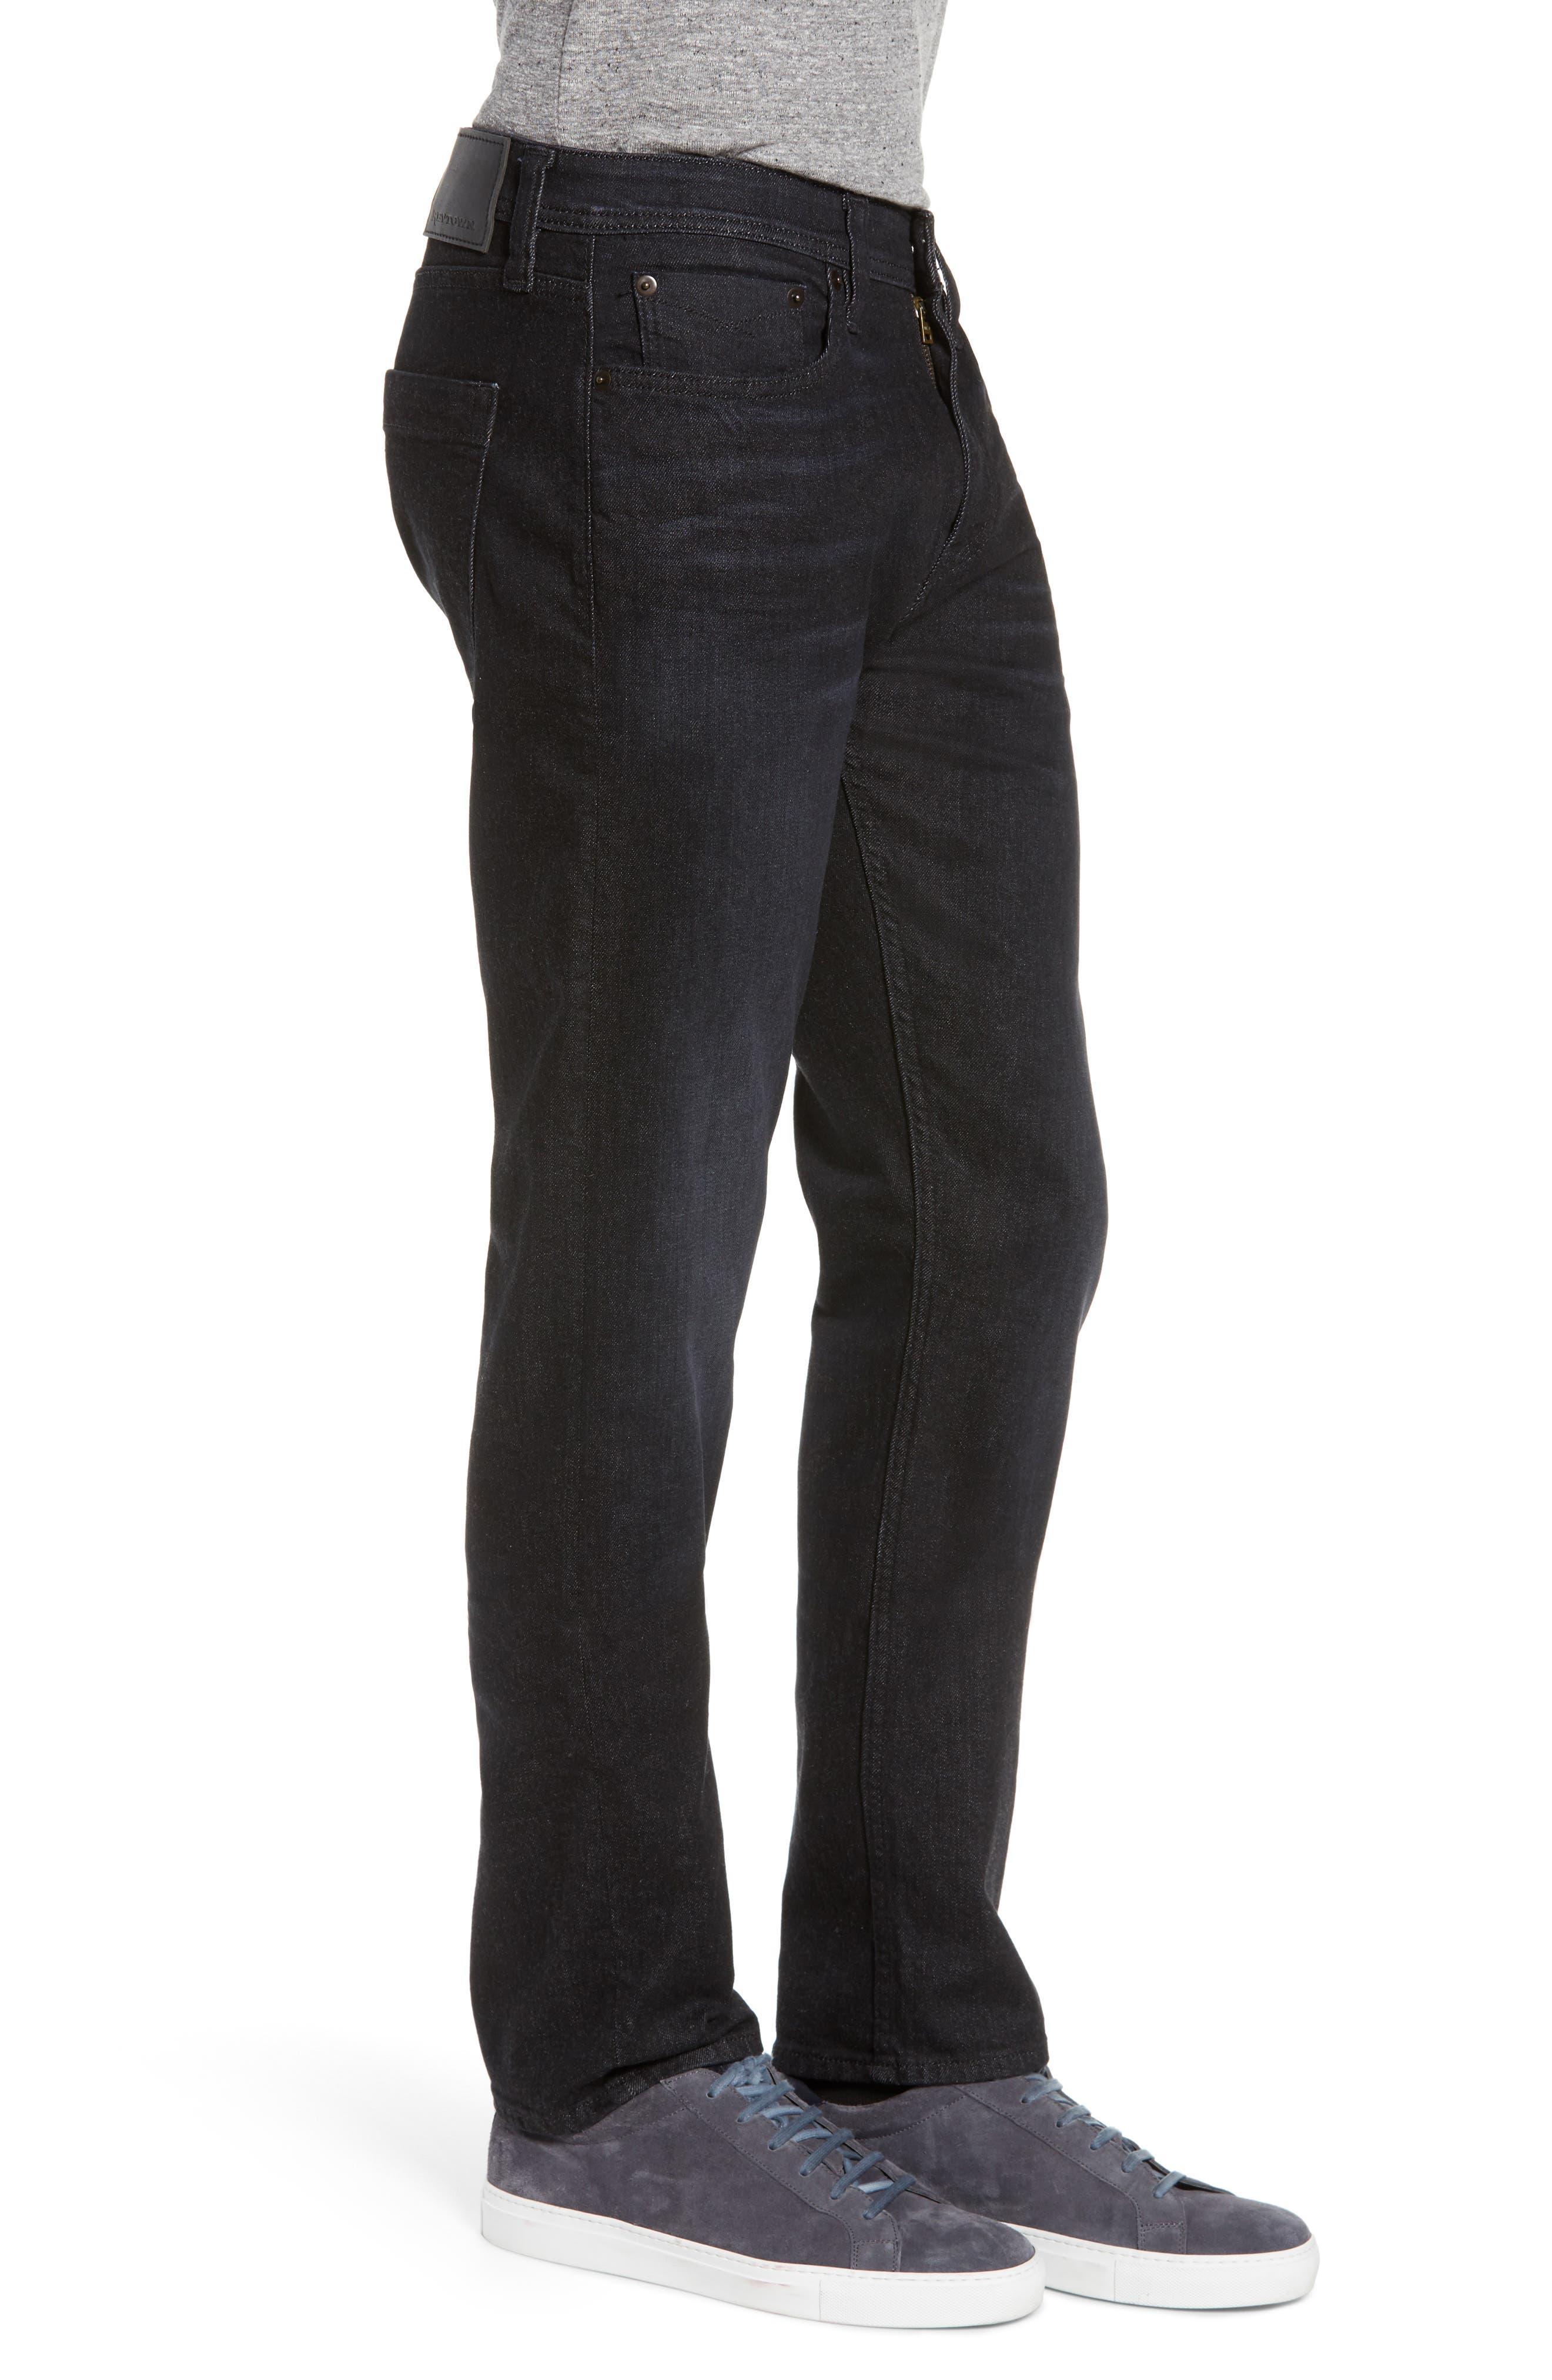 REVTOWN,                             Sharp Slim Fit Jeans,                             Alternate thumbnail 3, color,                             COAL BLACK